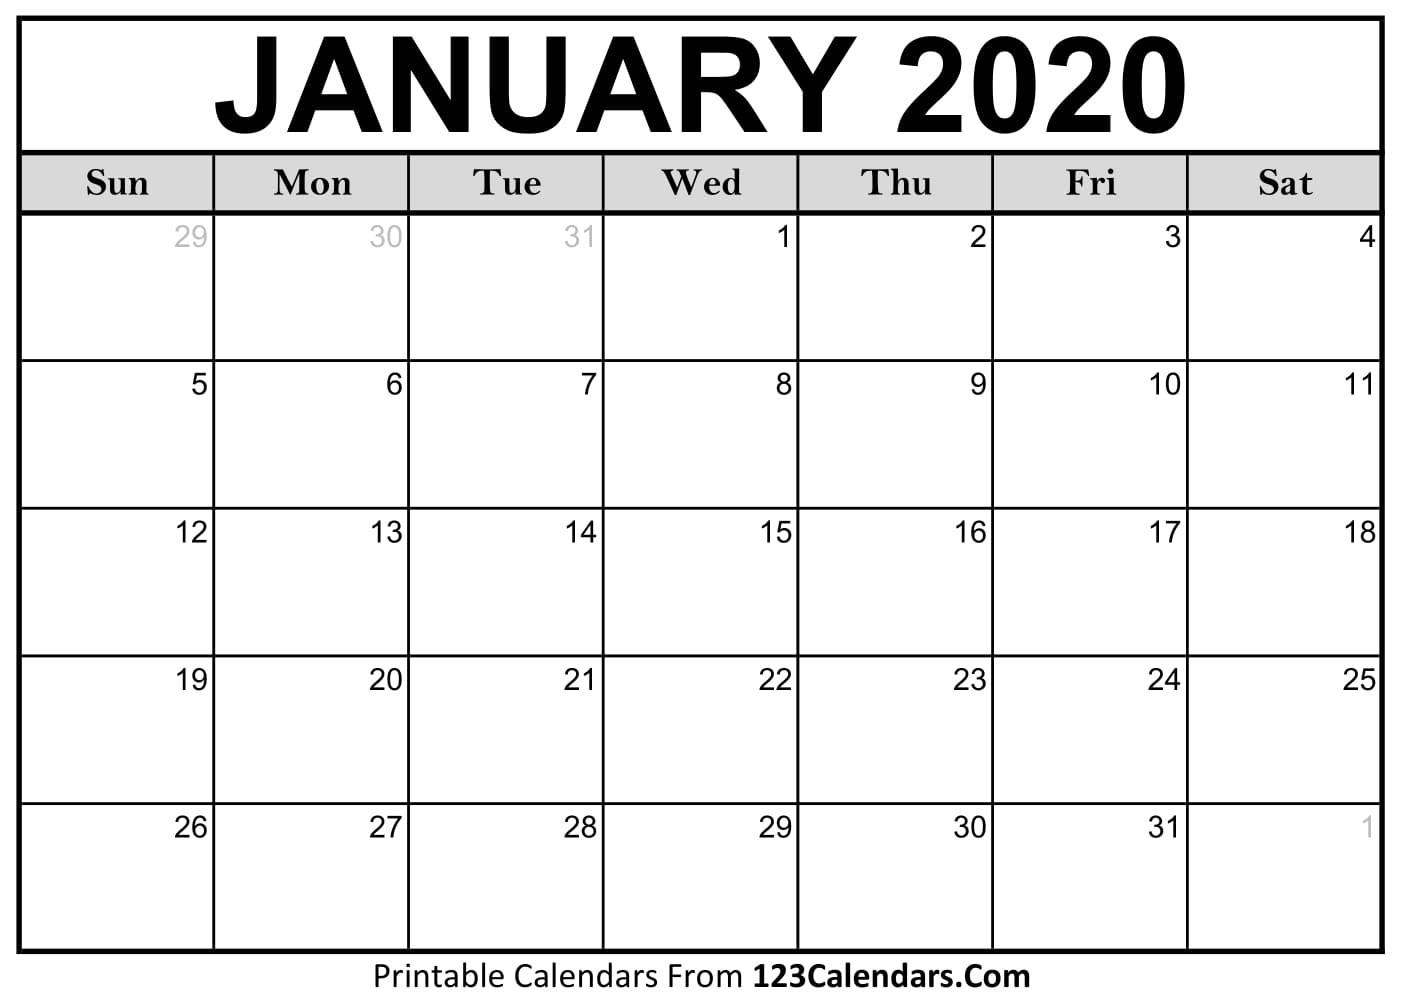 Free Printable Calendar | 123Calendars-Monthly Calendar June July August 2020